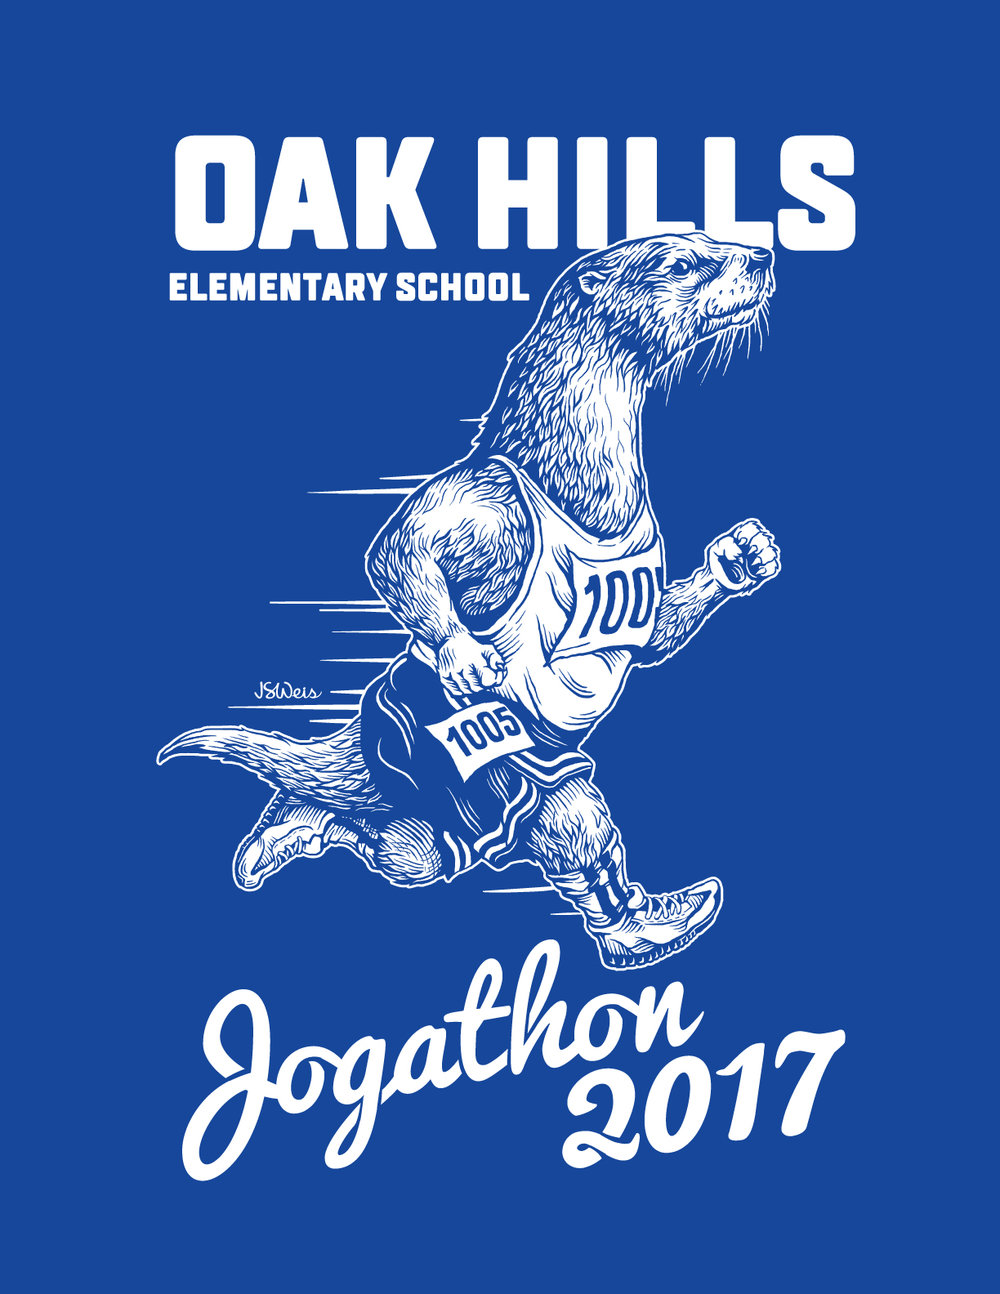 OakHills_Jogathon2017_v3.jpg